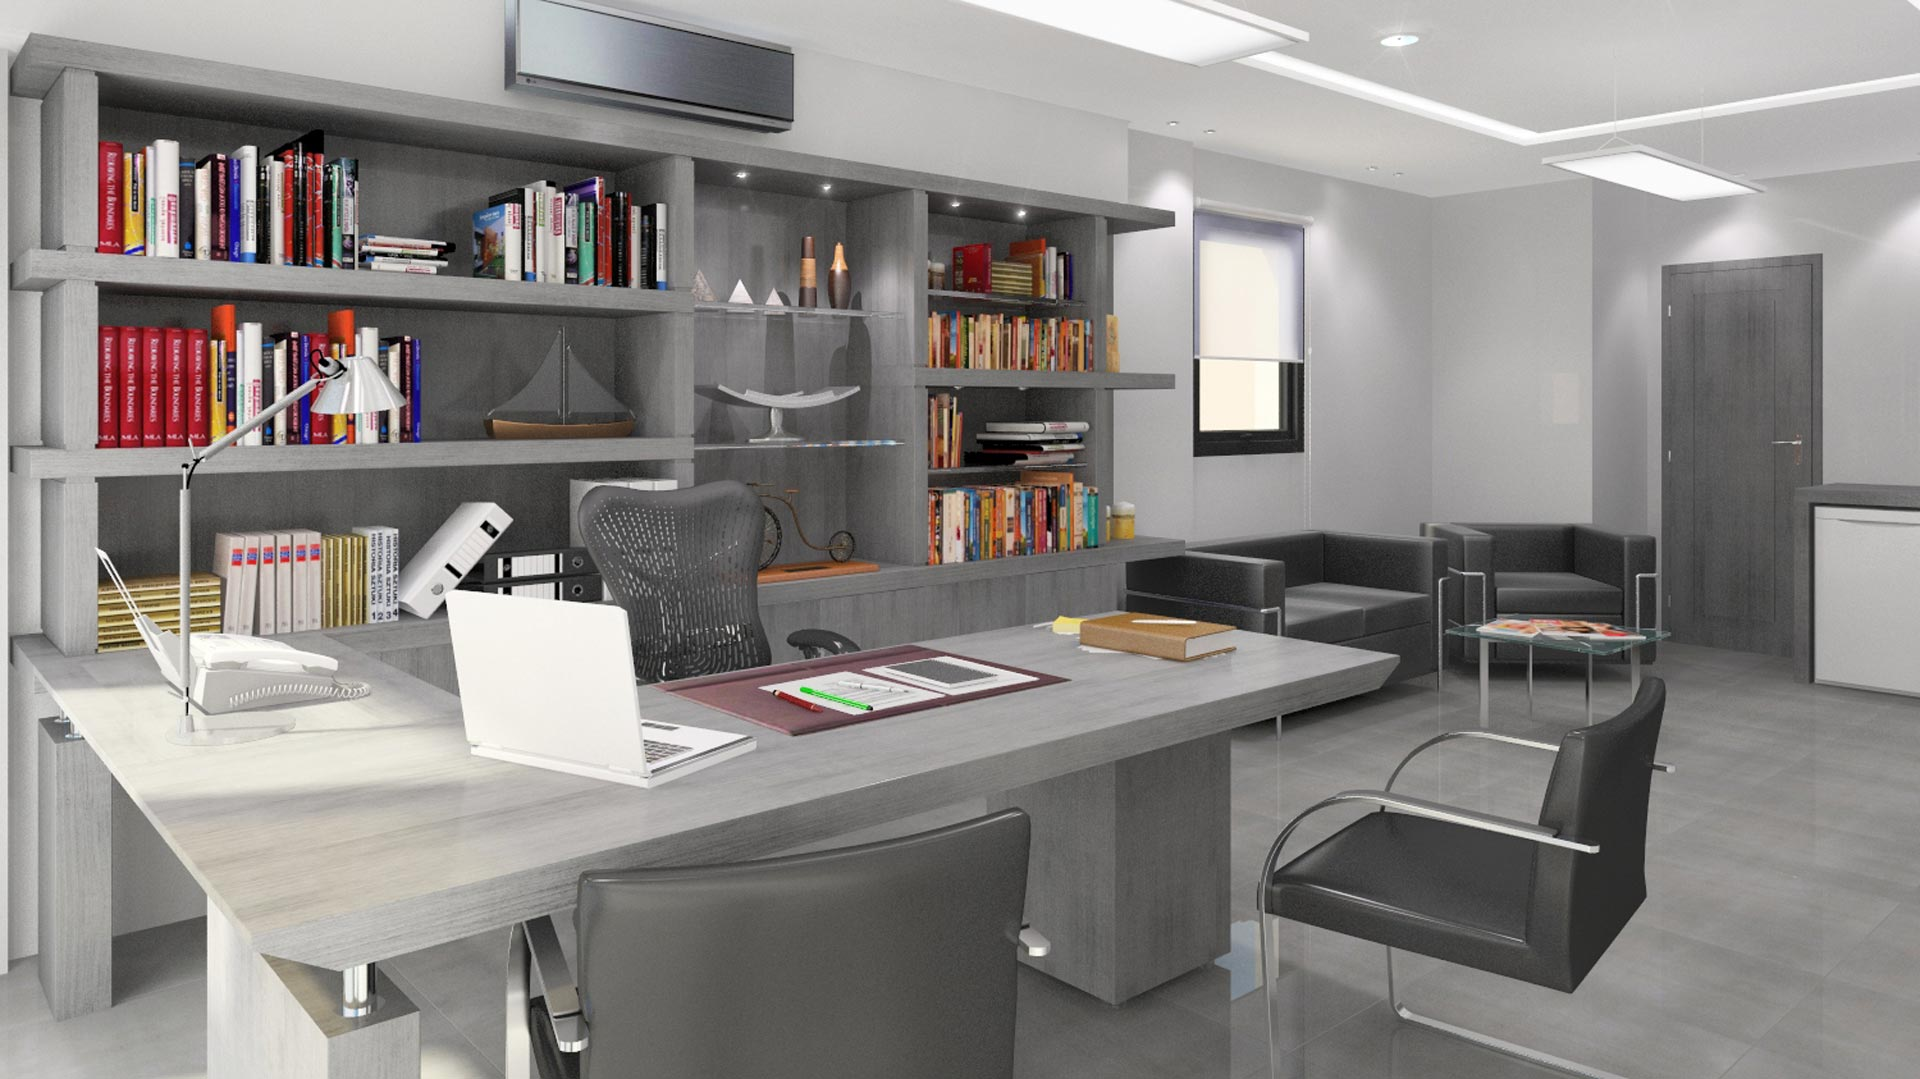 Im genes 3d renders interiores de oficinas i javier - Oficinas de arquitectura ...